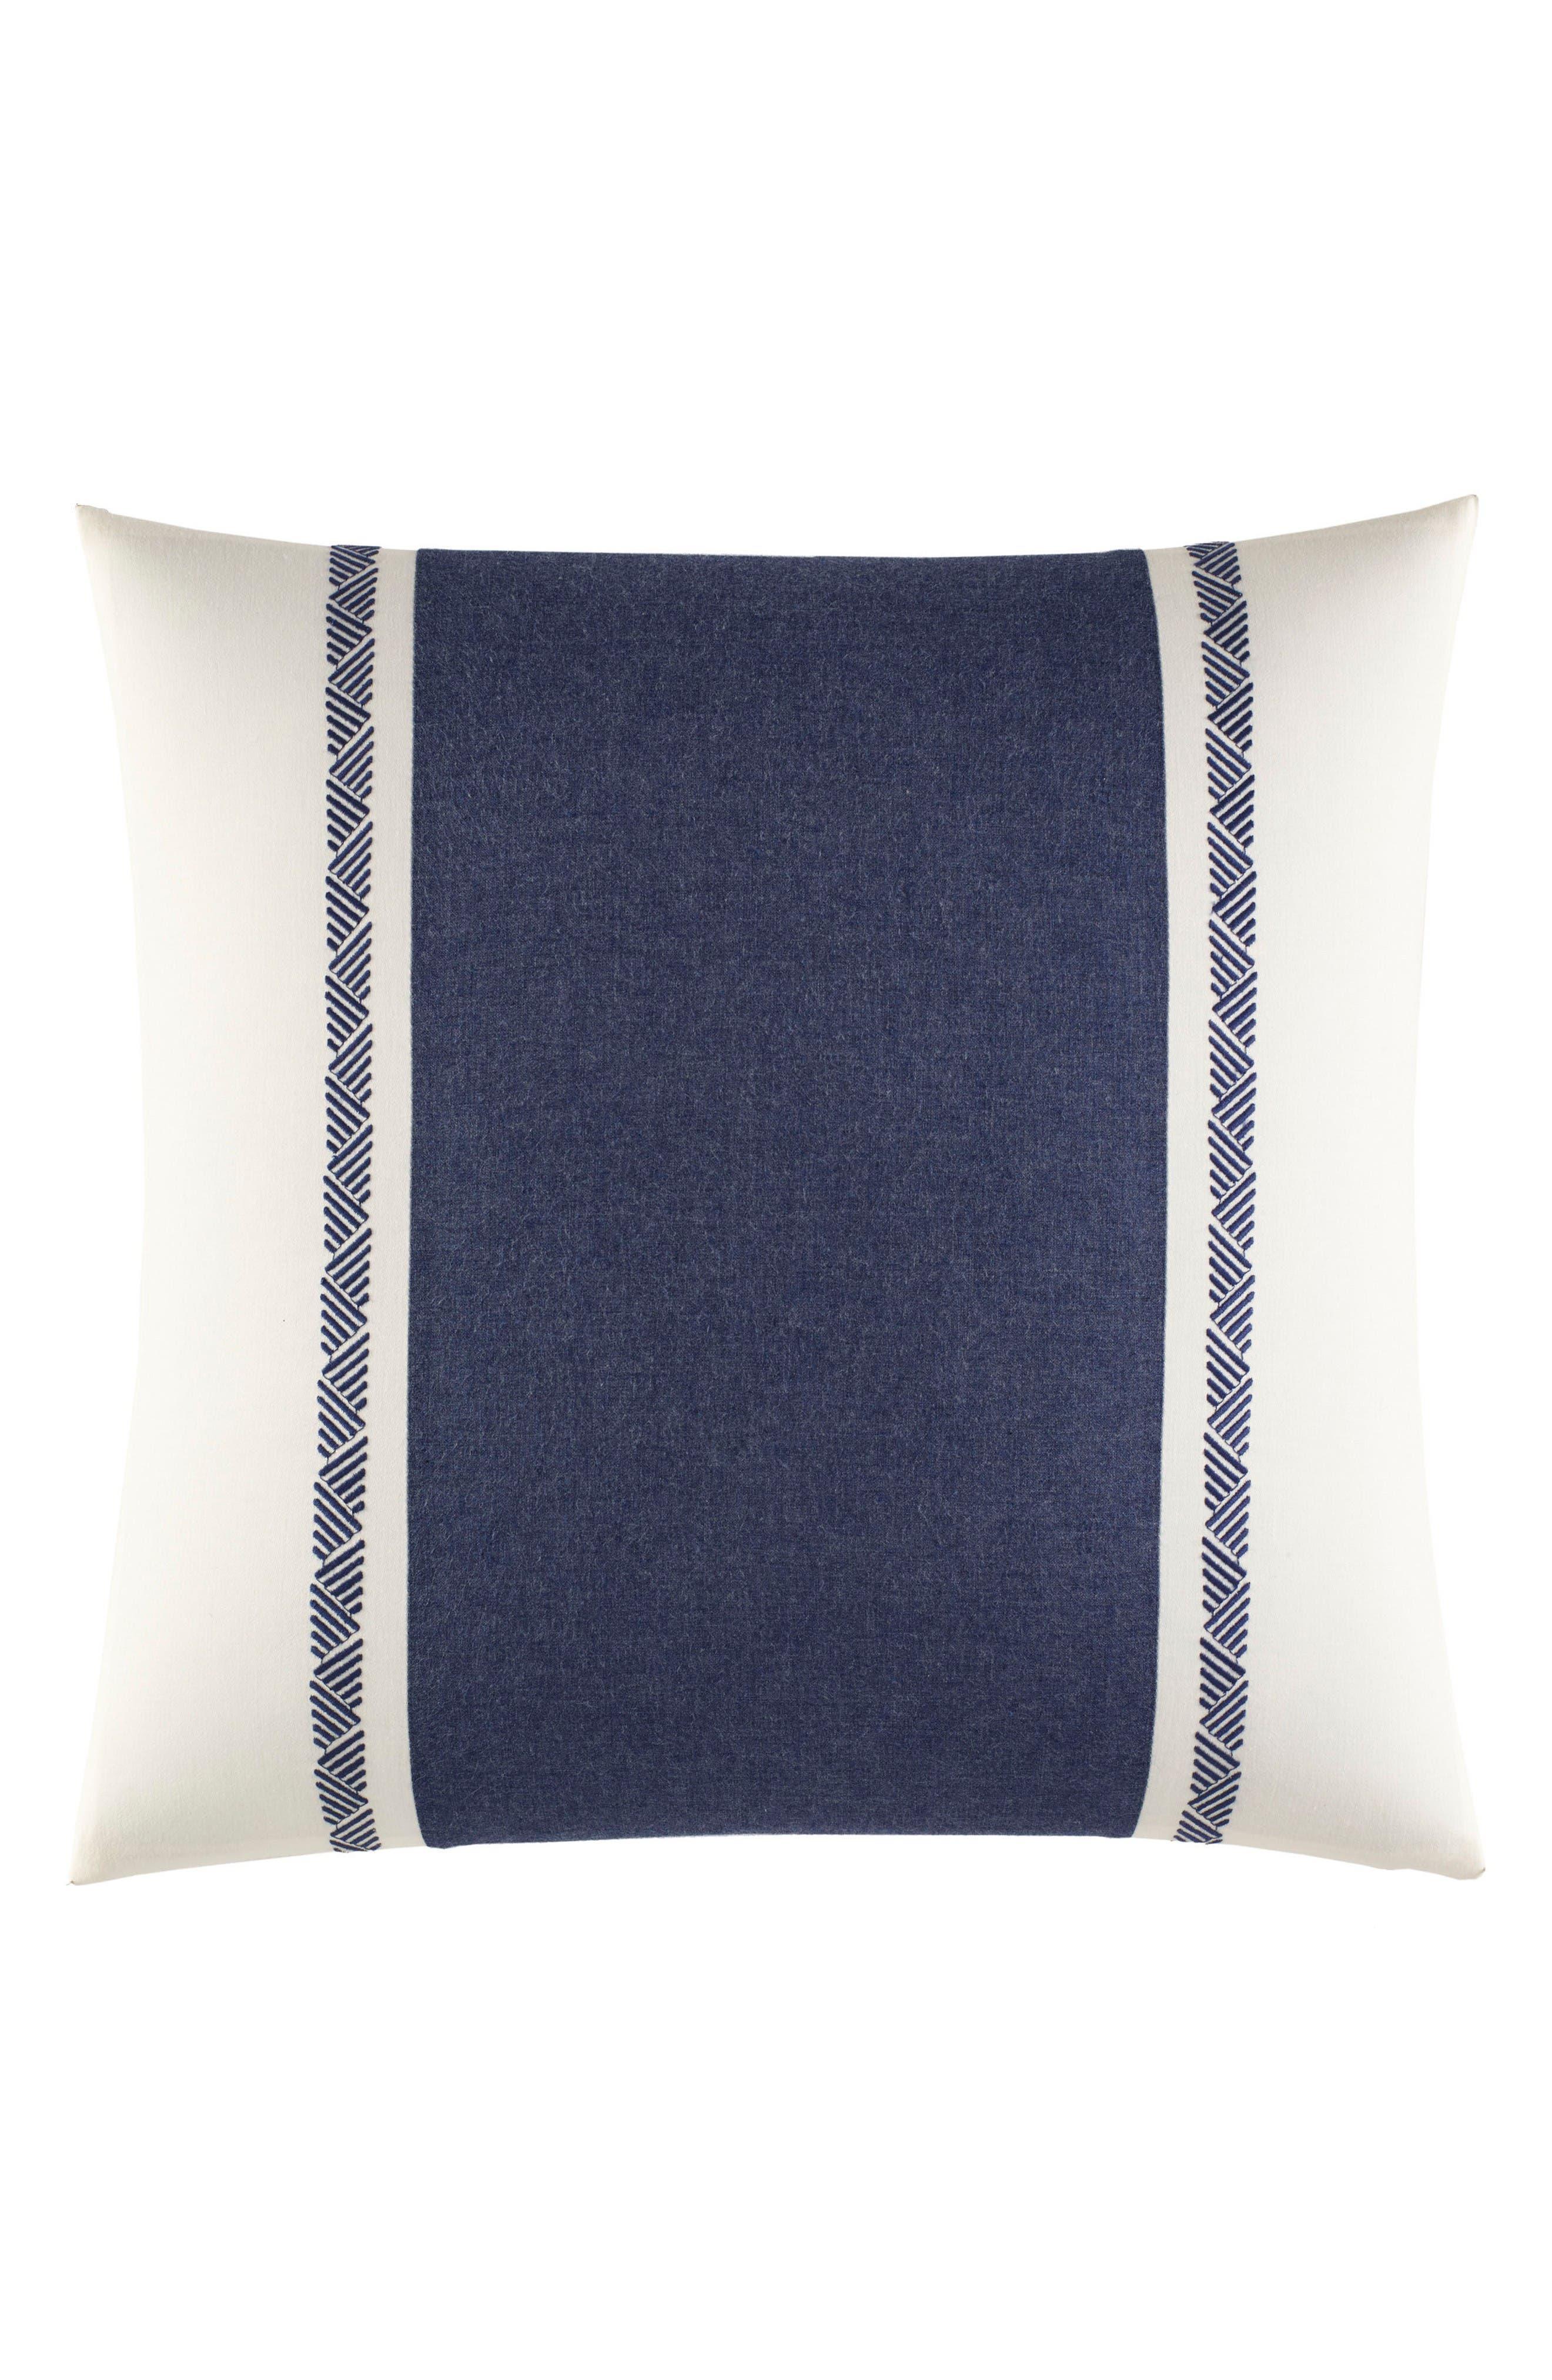 Alternate Image 1 Selected - Nautica Cunningham Accent Pillow